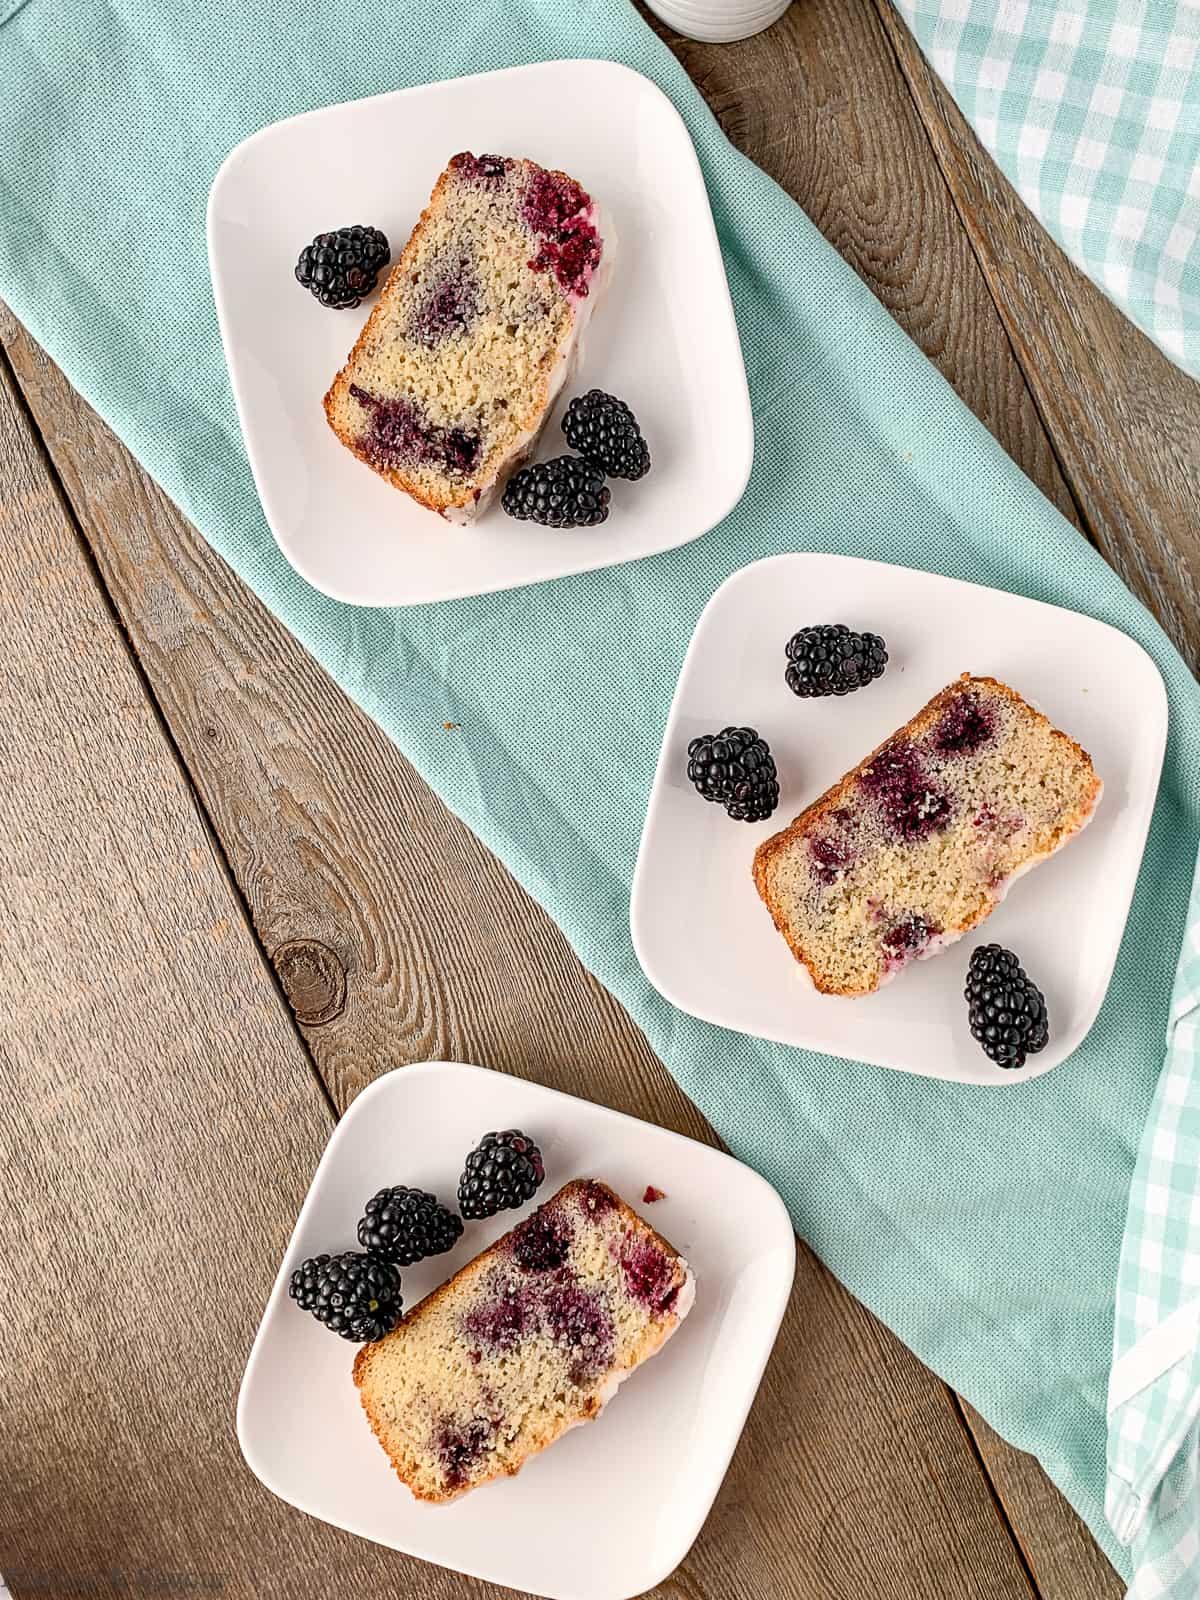 3 plates of keto blackberry bread